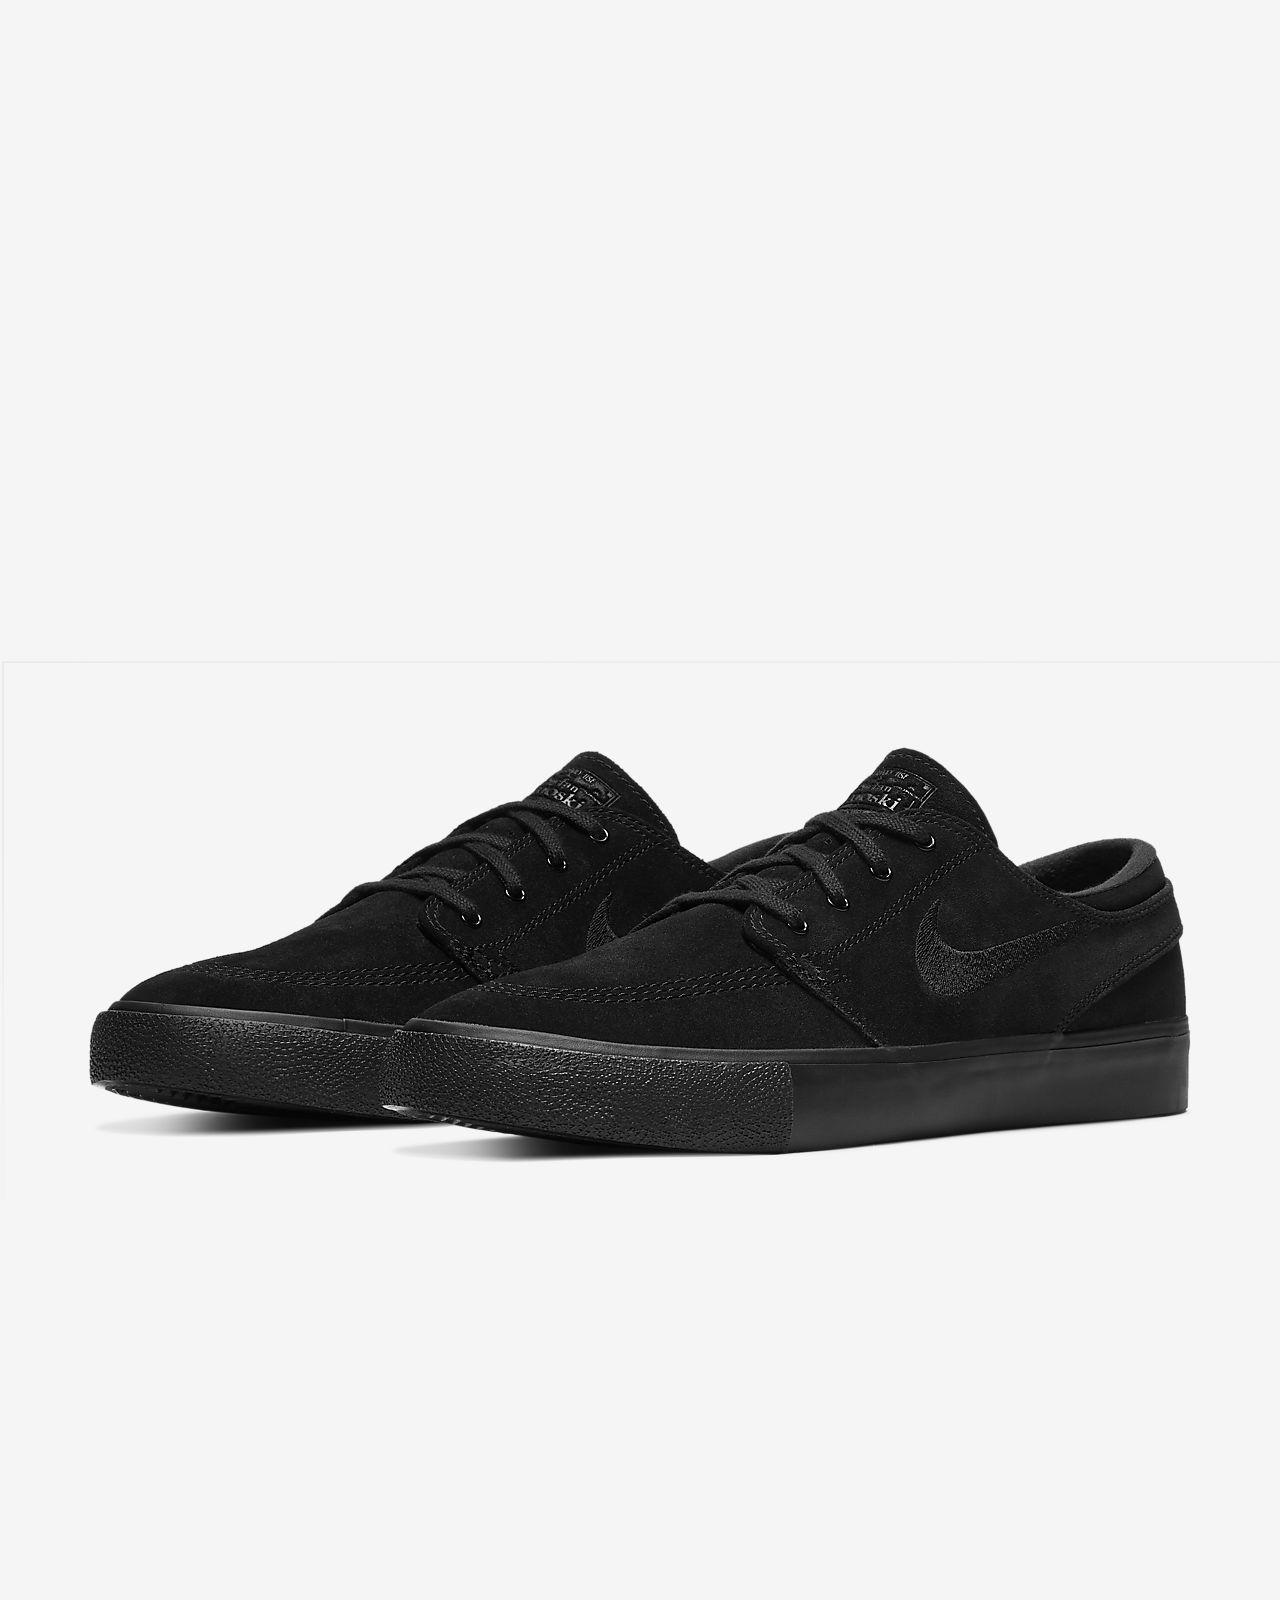 Nike SB Stefan Janoski Max Chaussure Nike Skateboard Pas